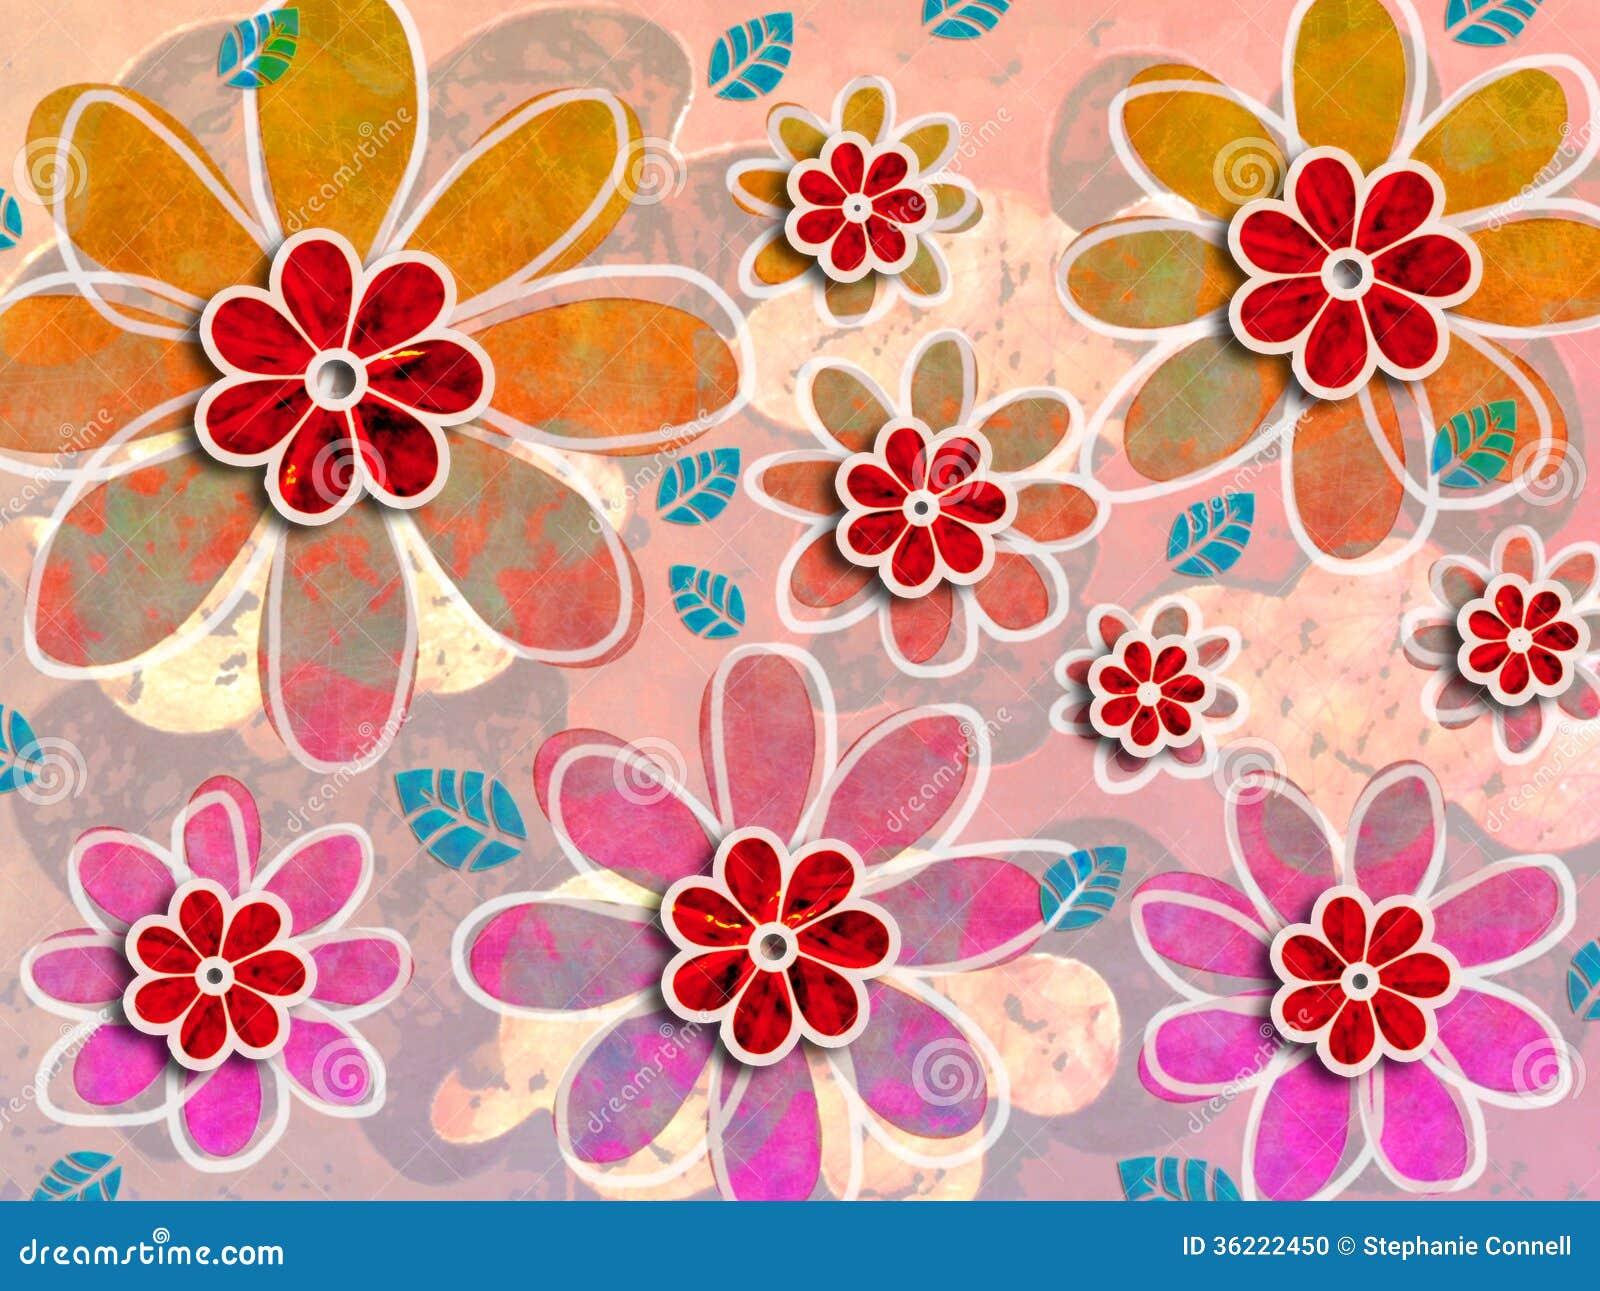 Psychedelic Flower Art...